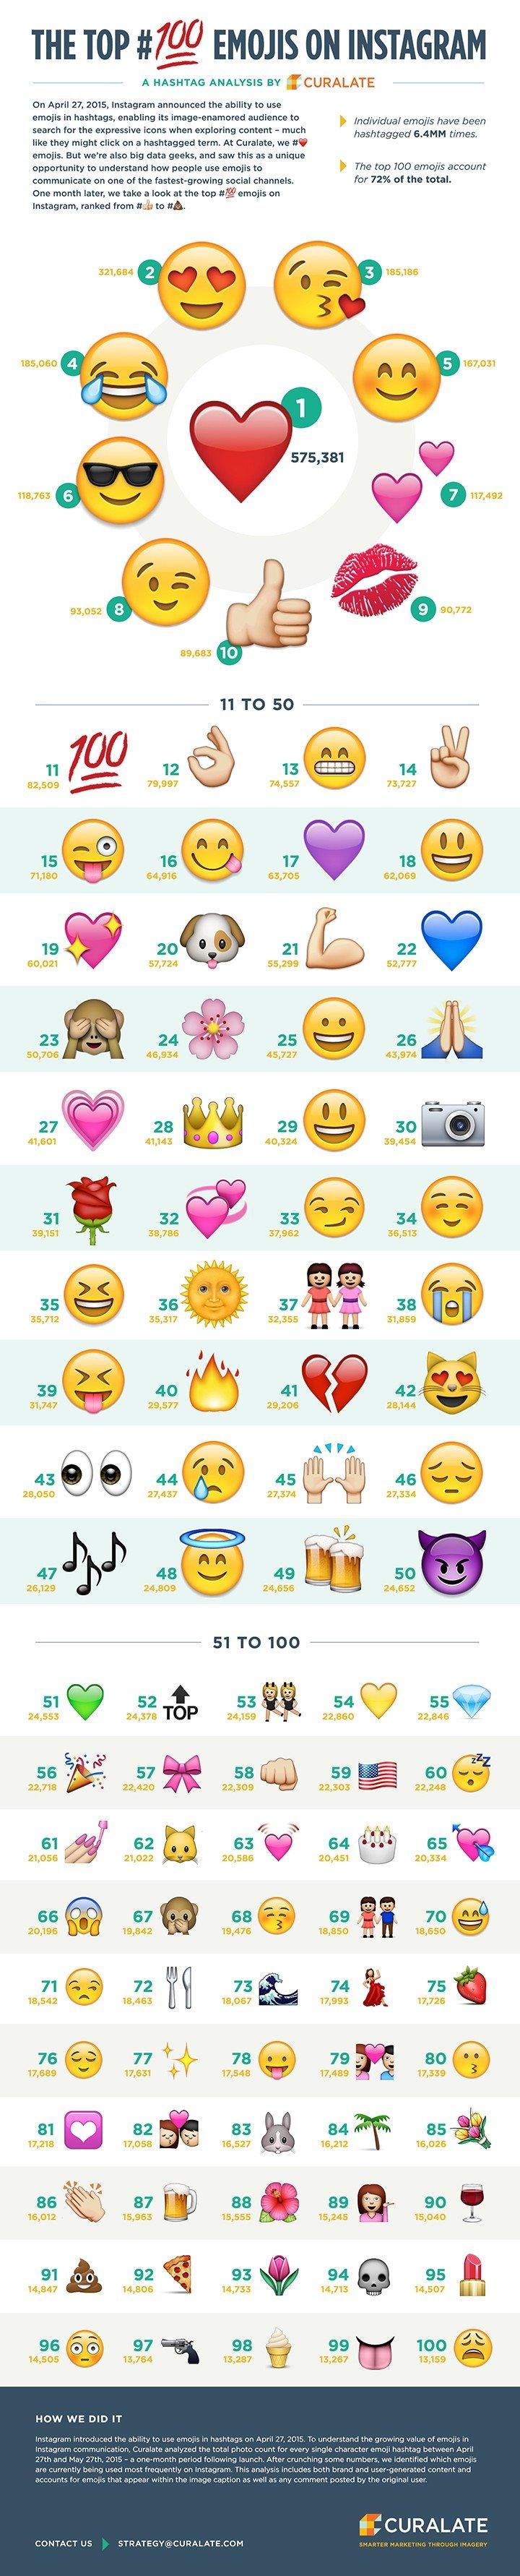 Top 100 Emoji